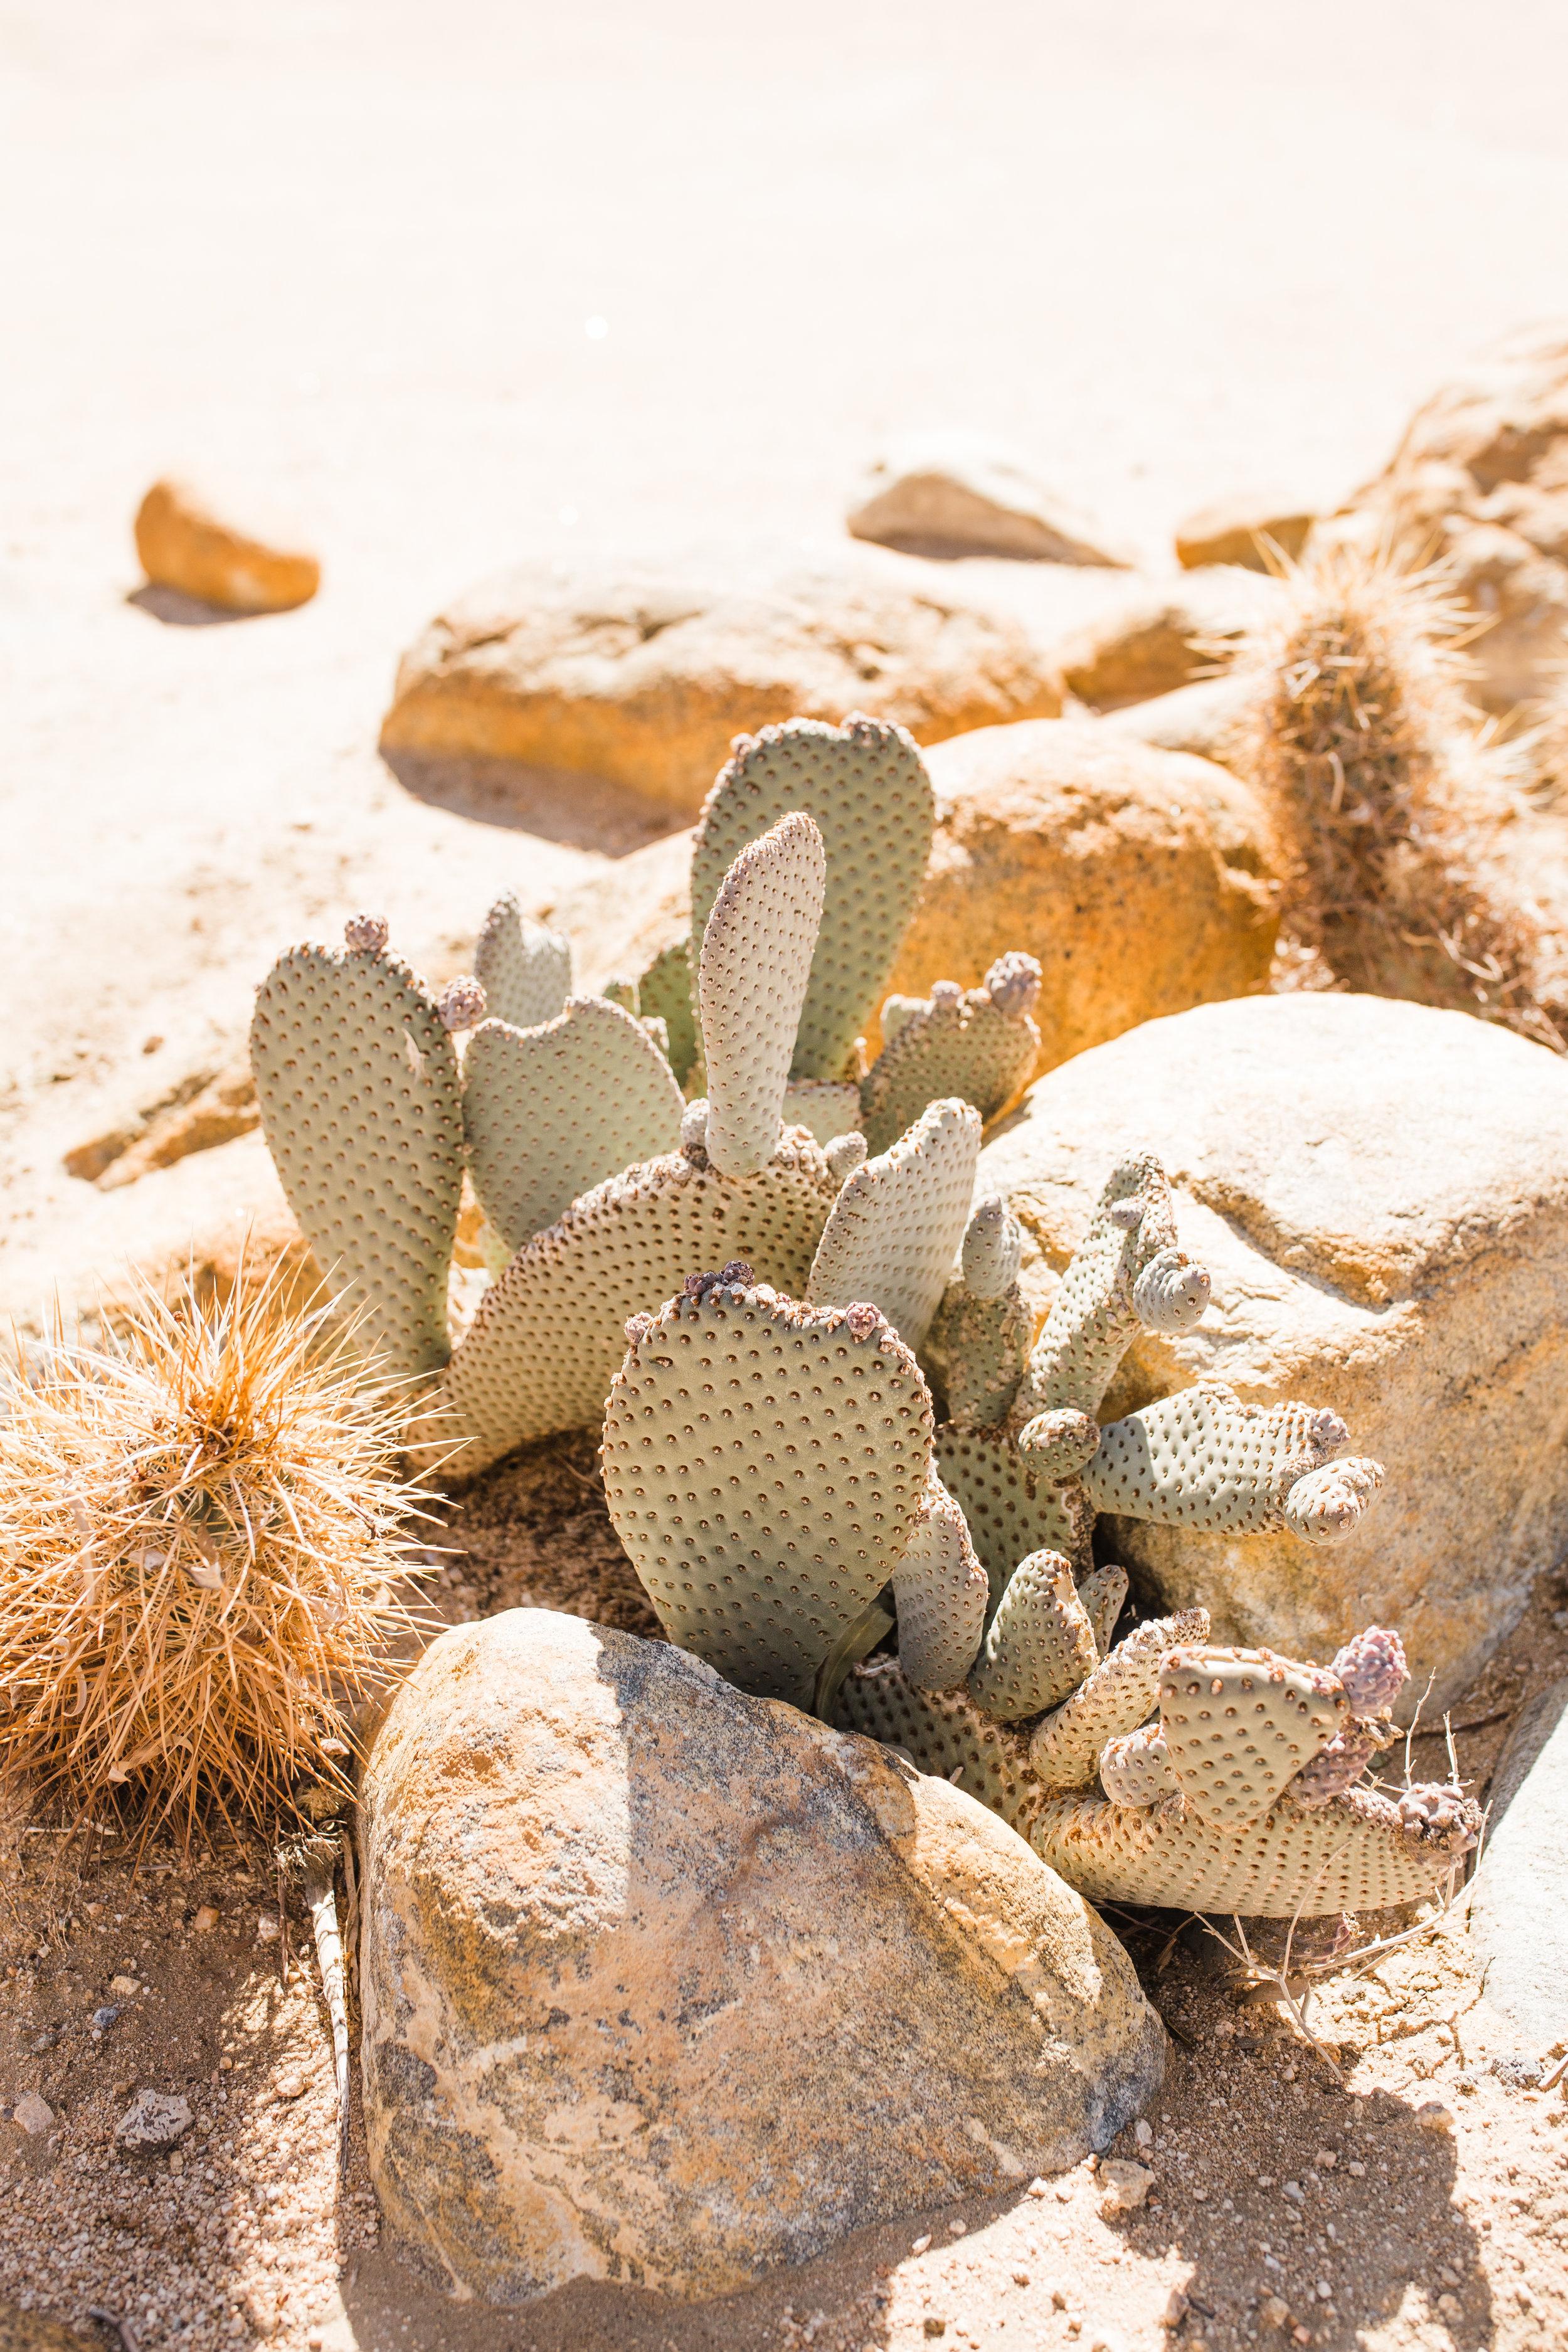 desertromantics-6.jpg